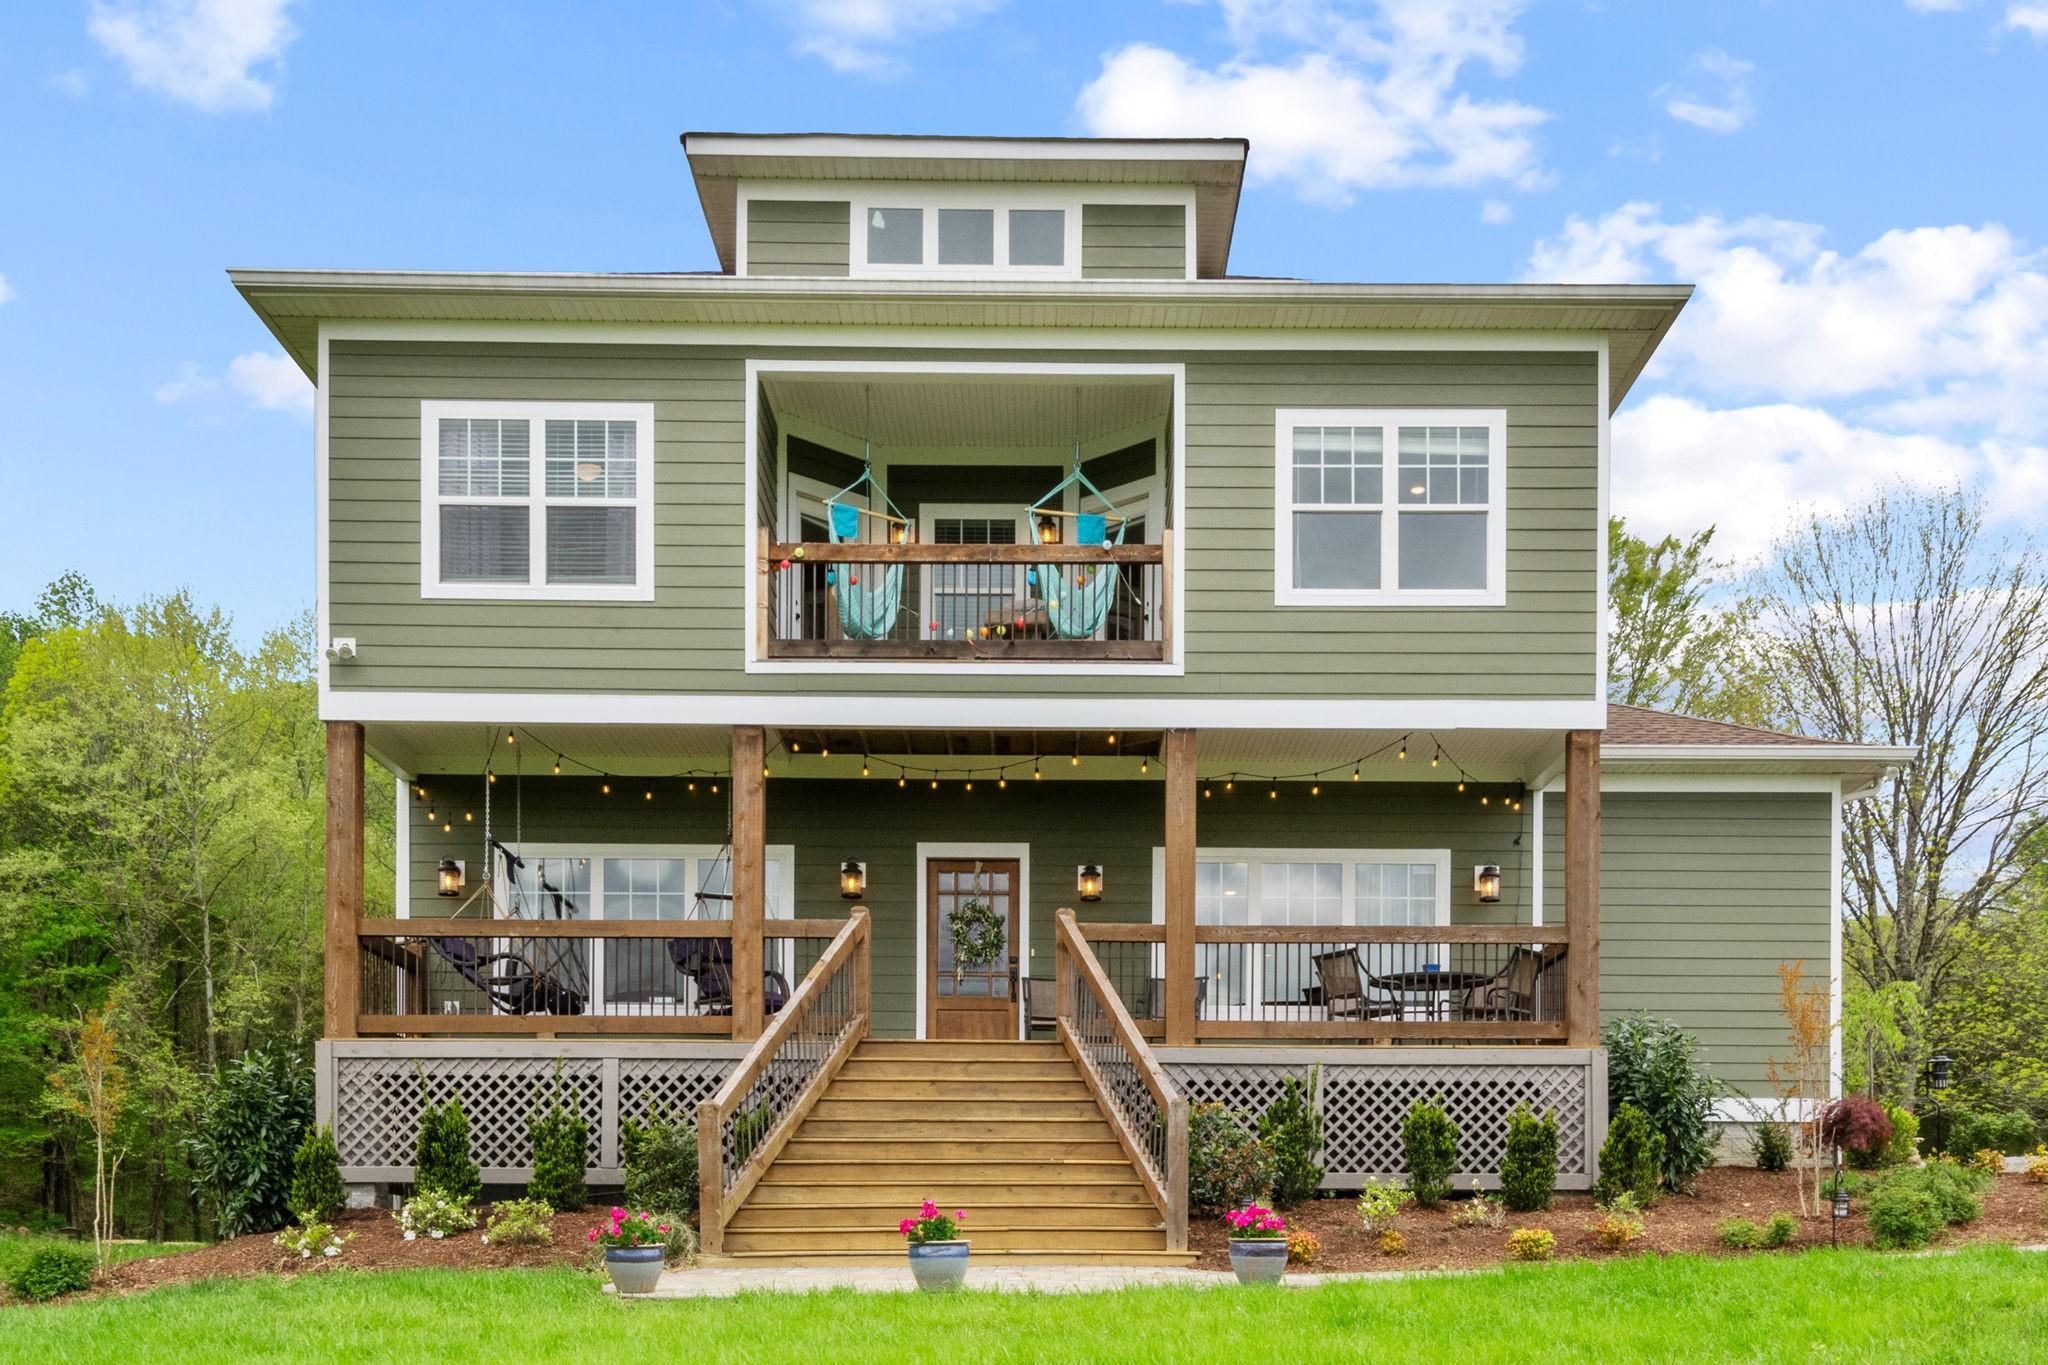 337 Vantrease Ln Property Photo - Gallatin, TN real estate listing